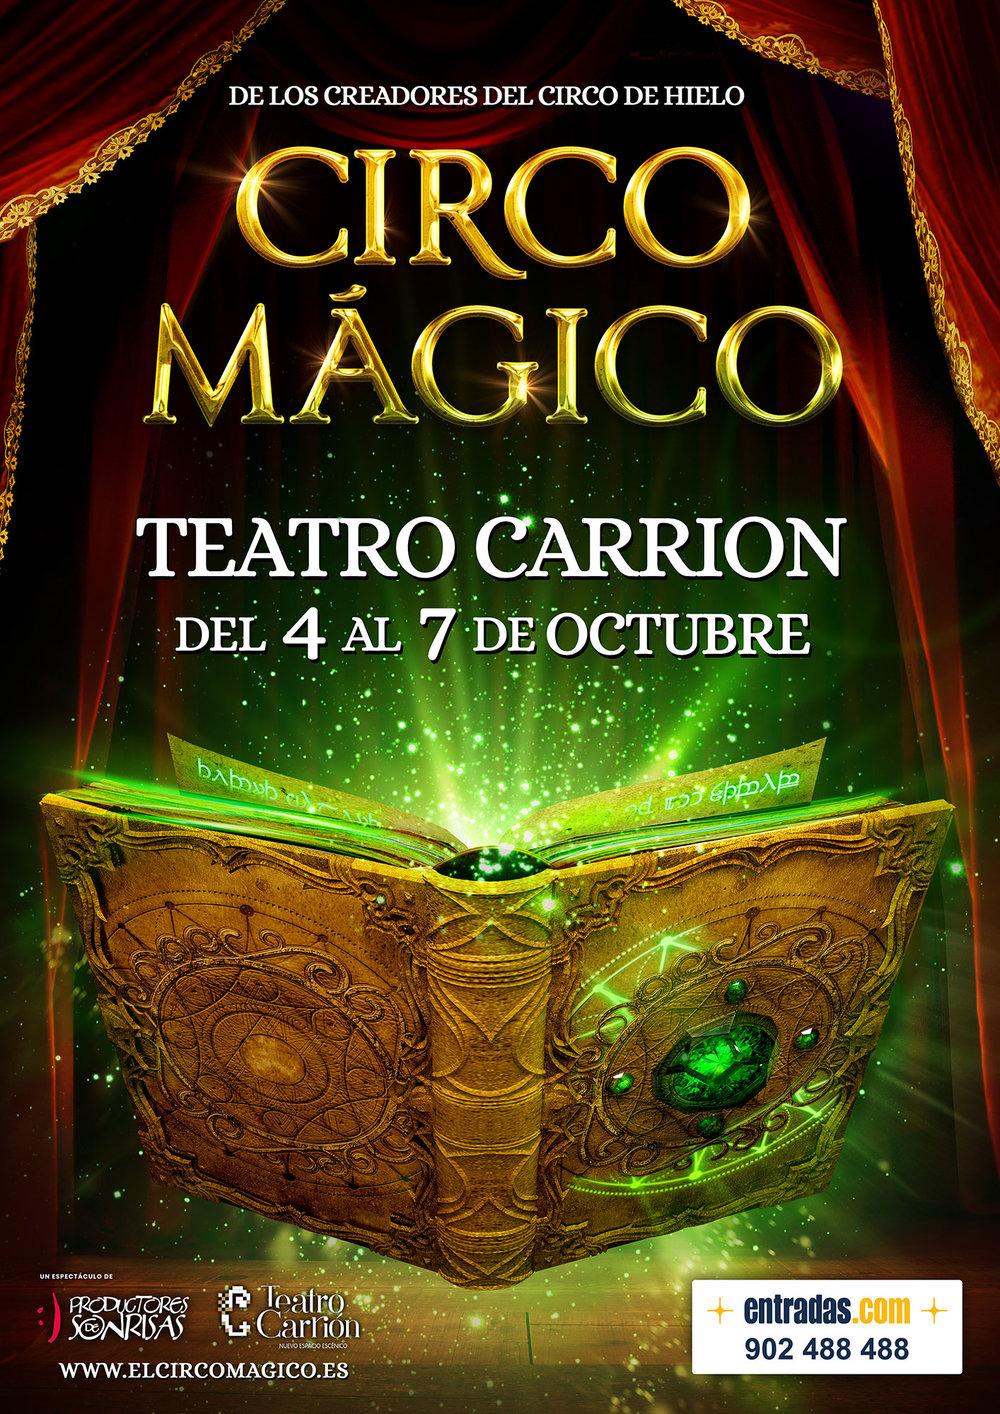 circo-magico-teatro-carrion-valladolid.jpg